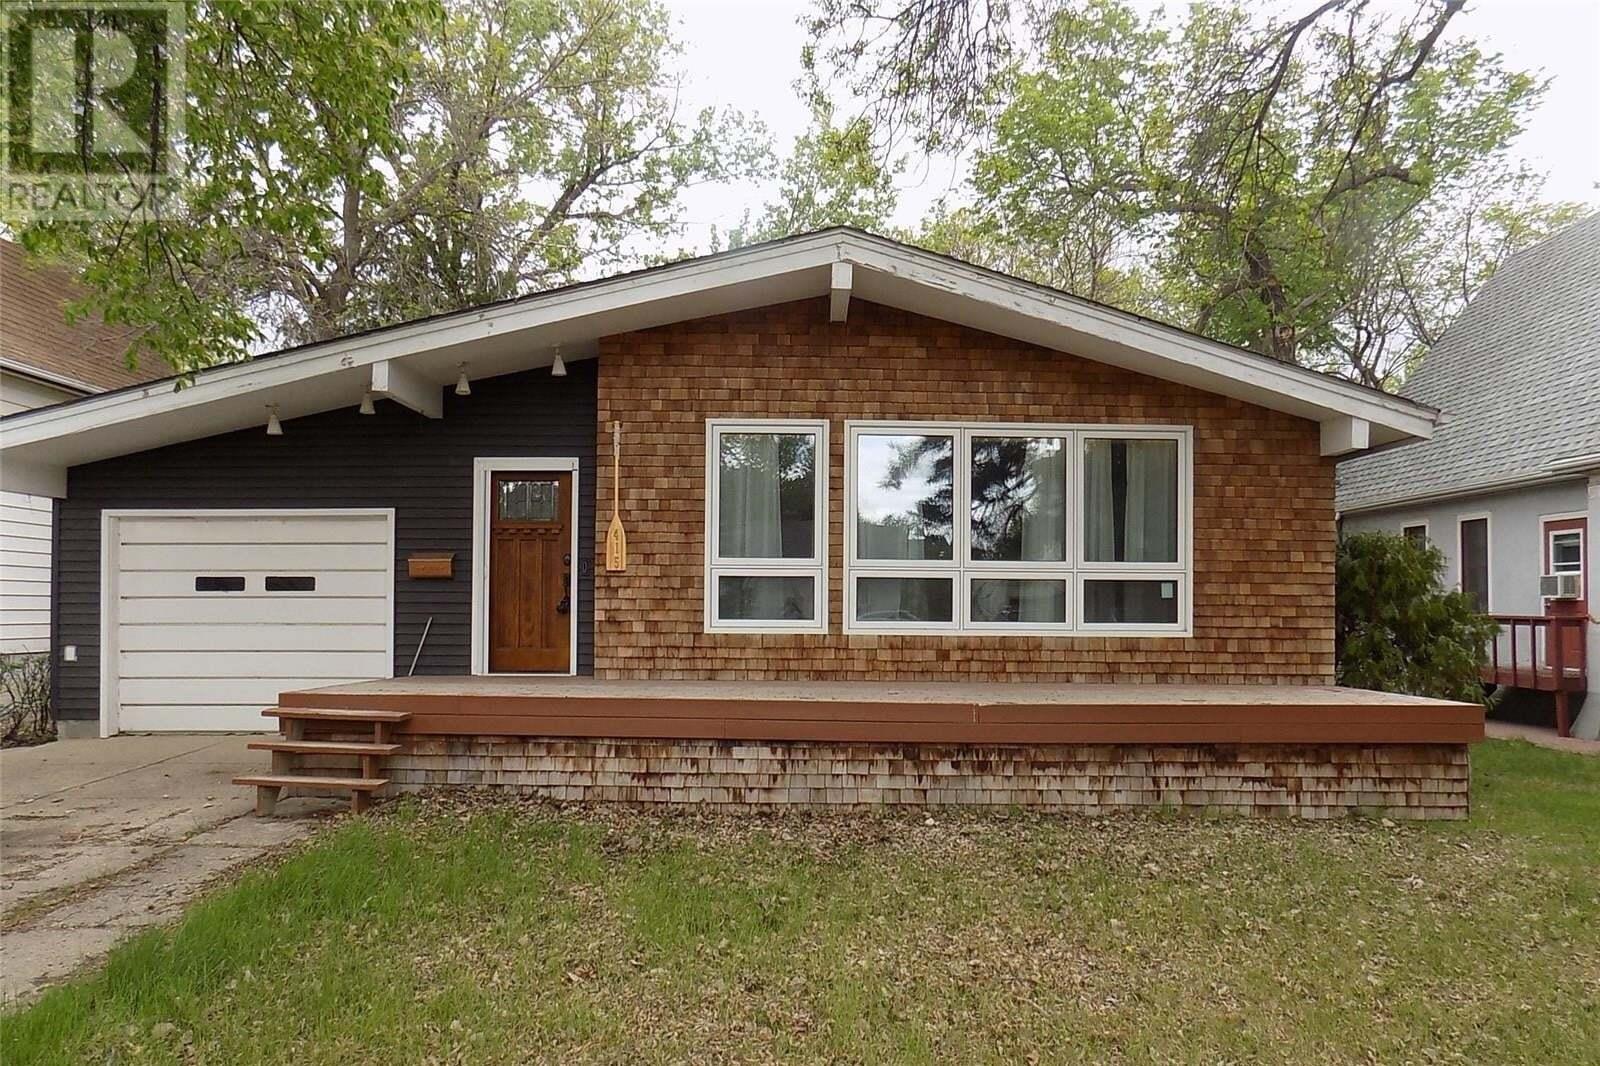 House for sale at 415 Assiniboia St Weyburn Saskatchewan - MLS: SK809946